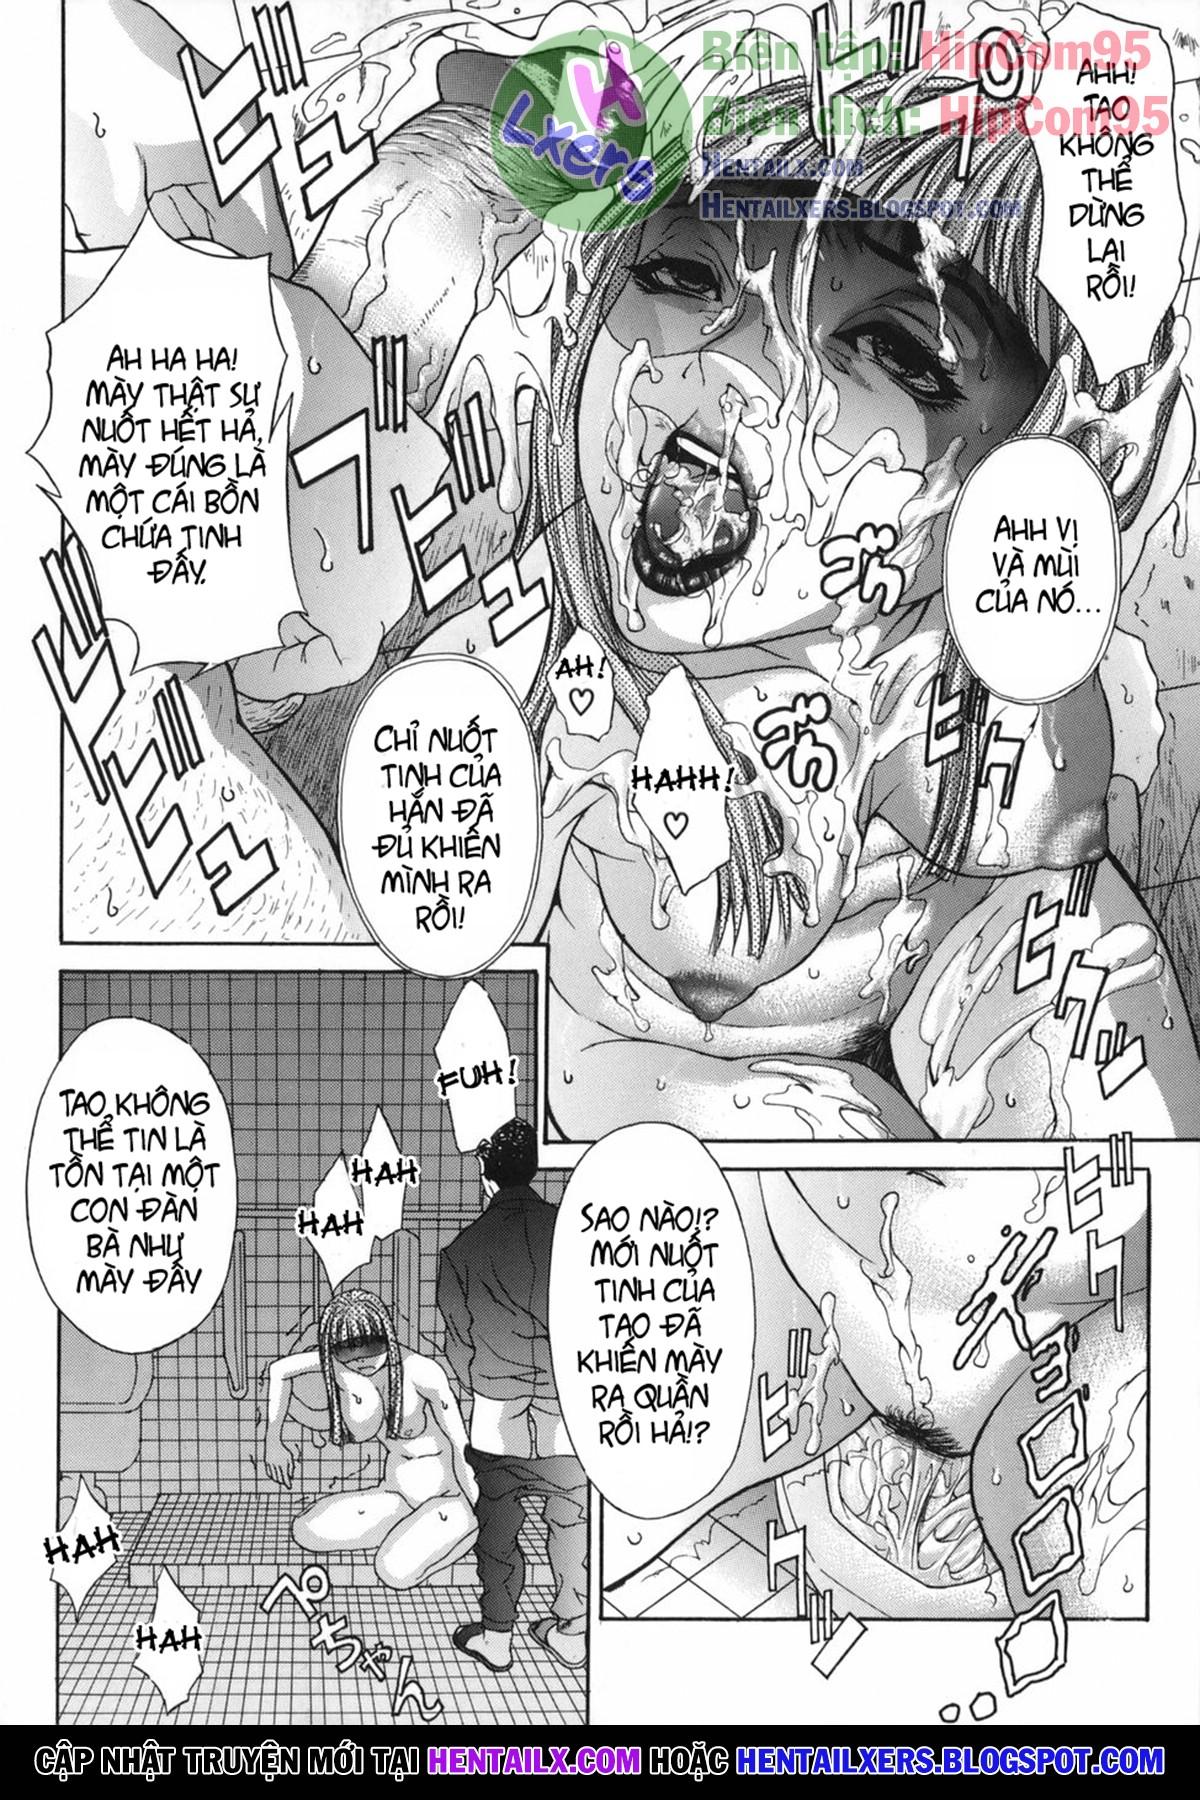 Hình ảnh 022_boinzuma_022 in Boinzuma - Motherlike Obscene Wife